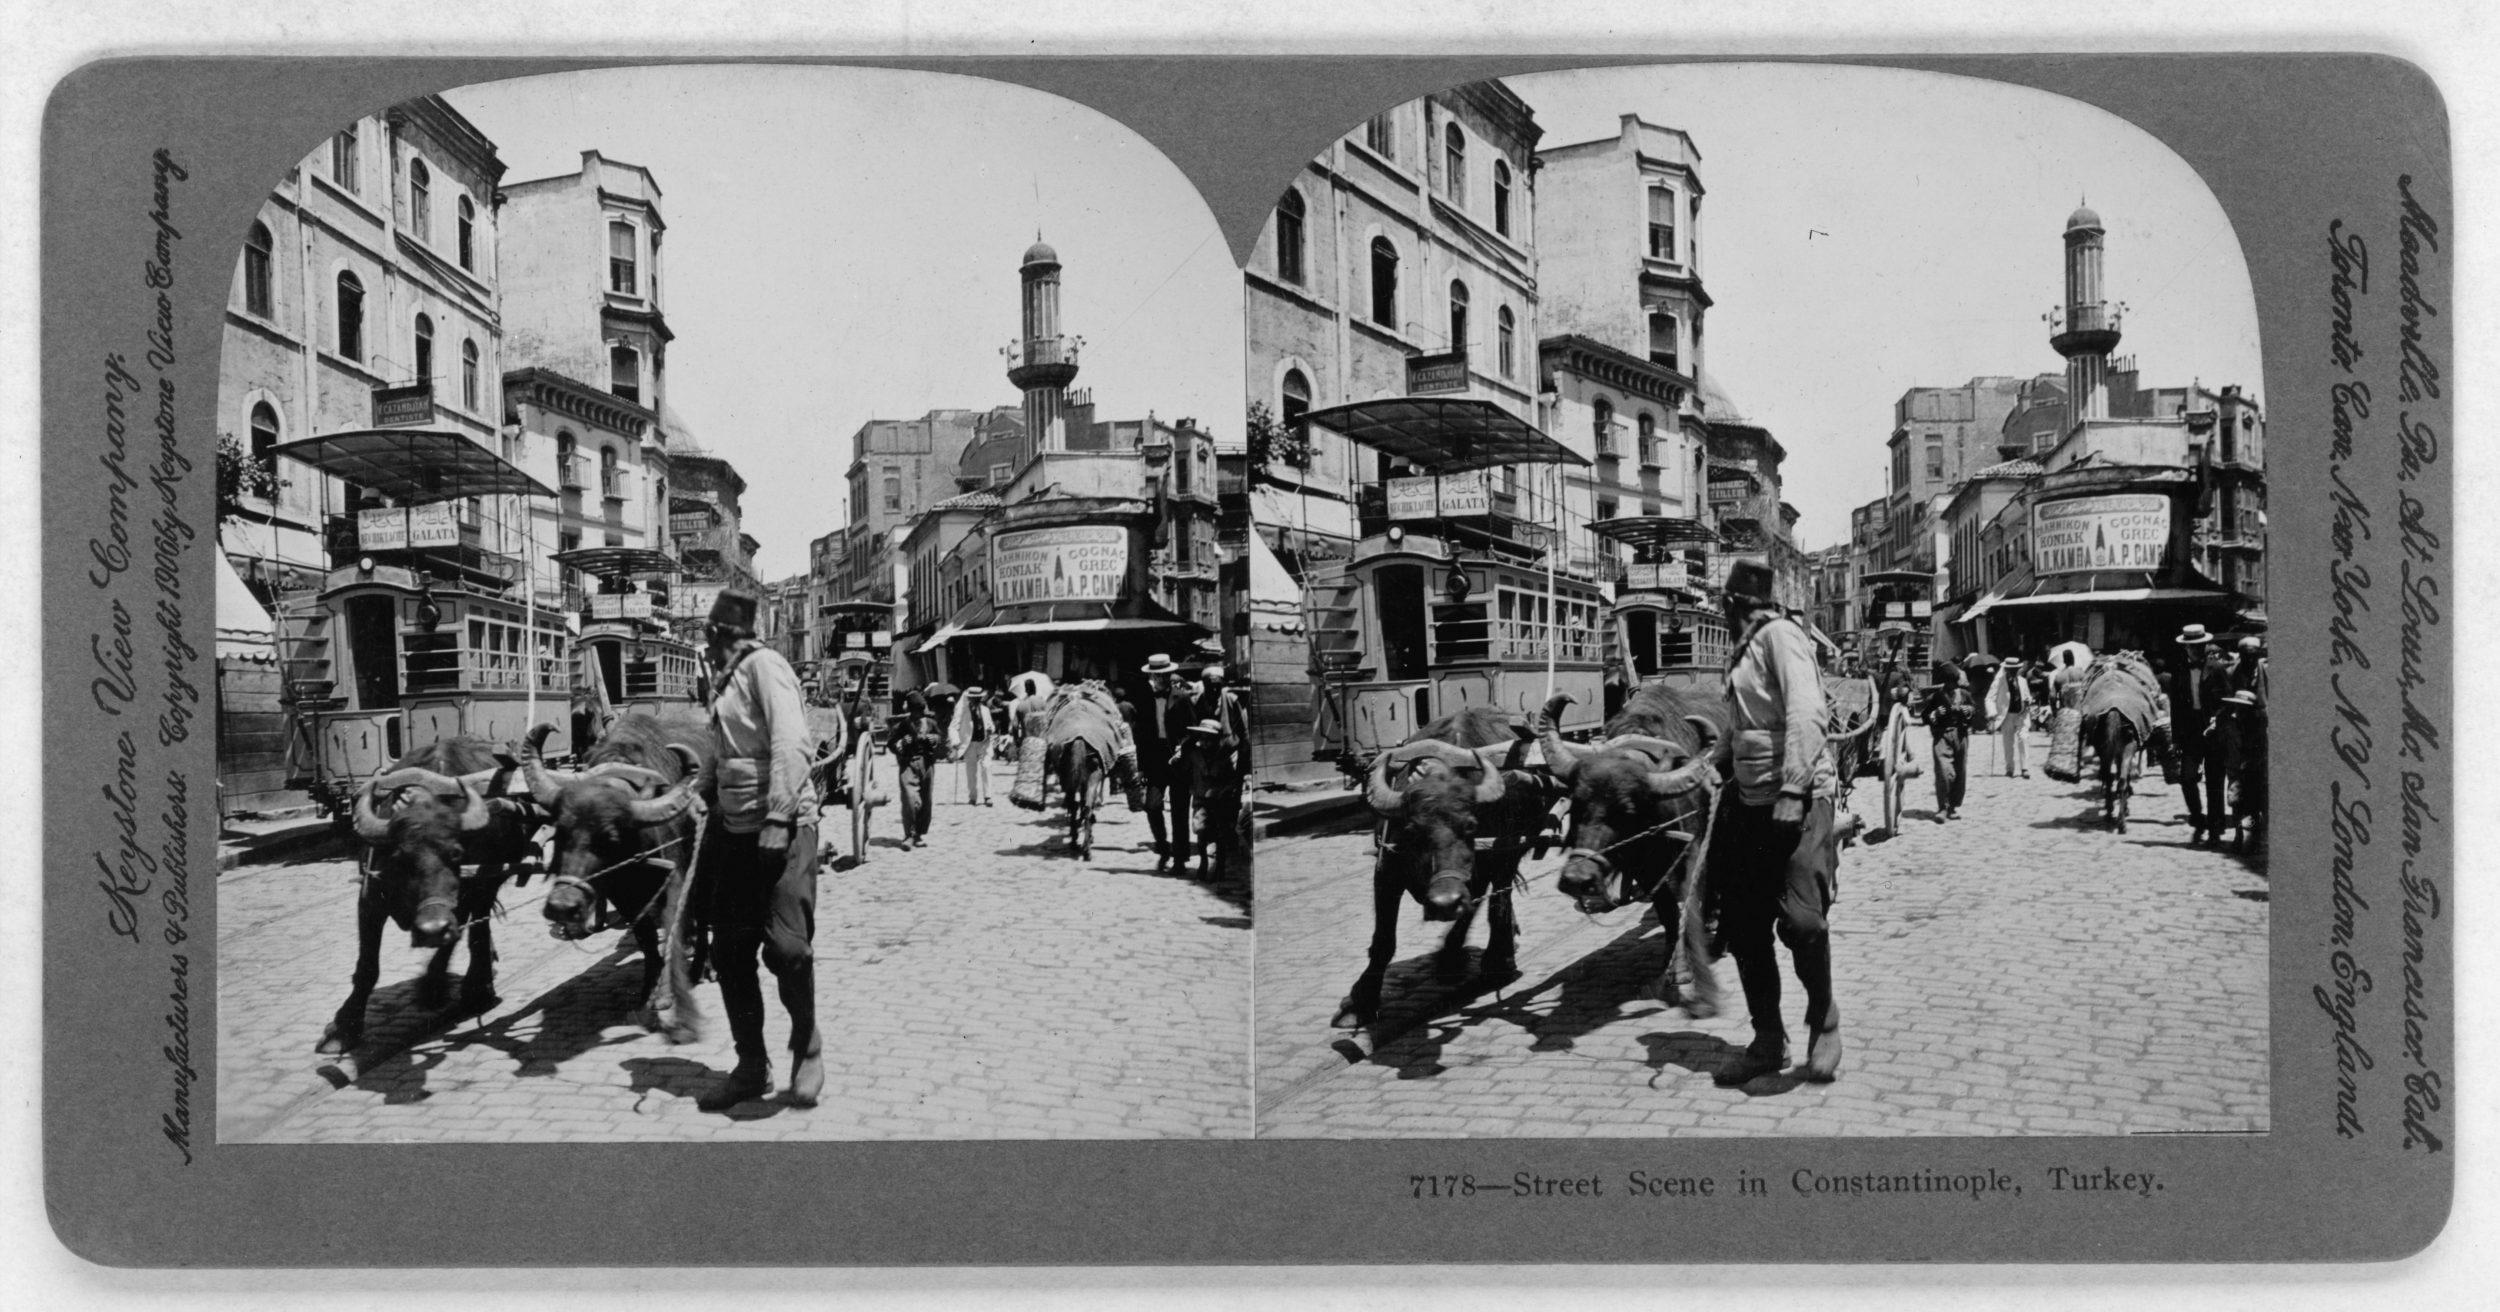 Street scene Constantinople of Edmondo De Amicis